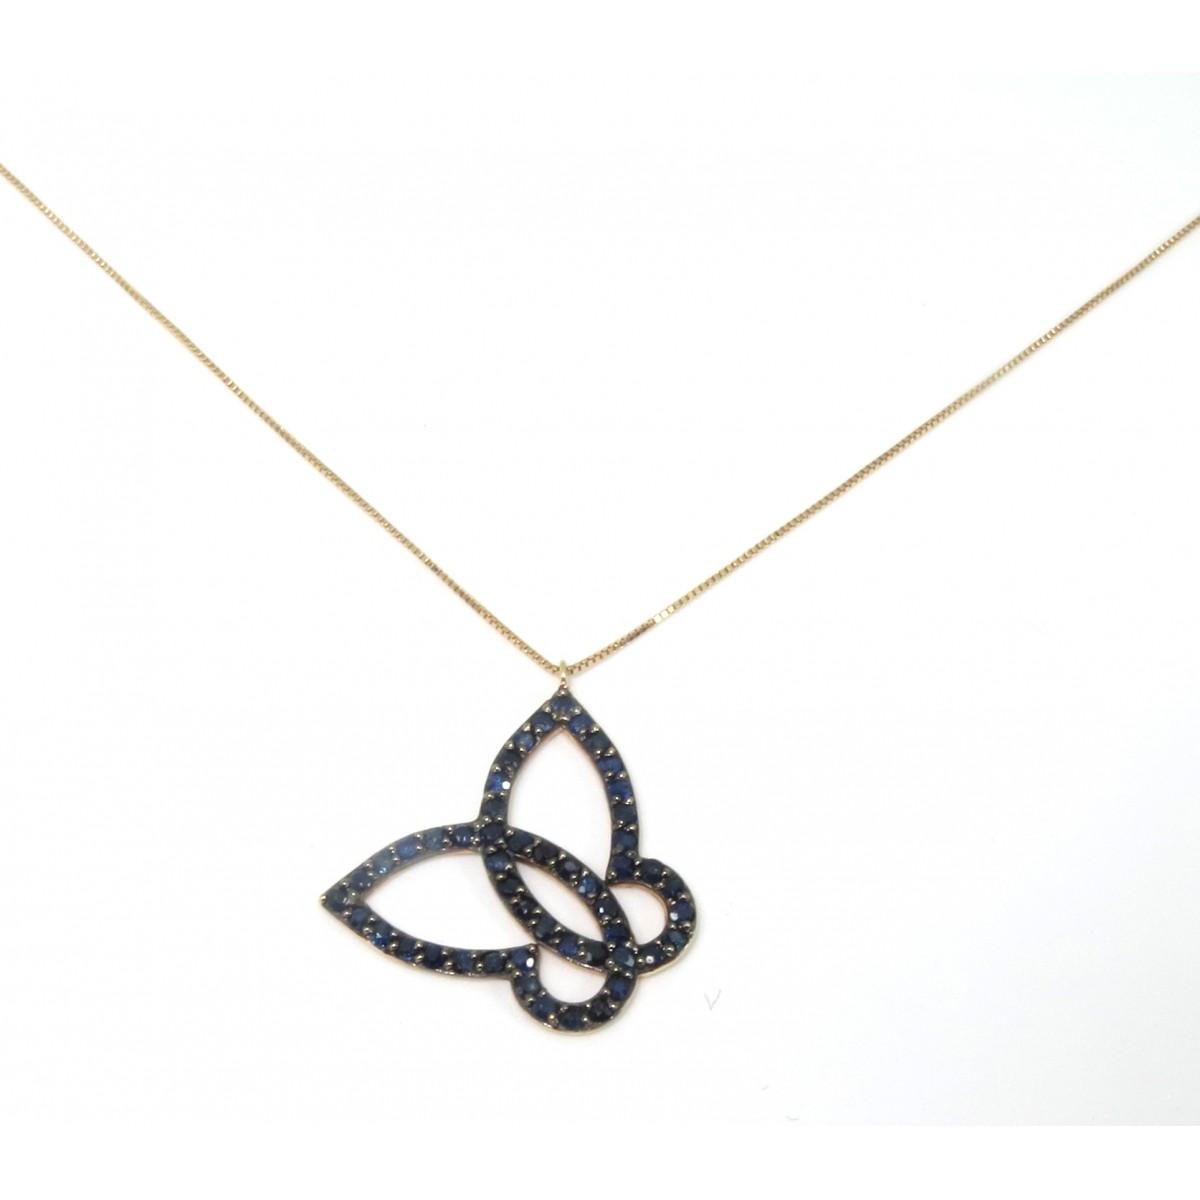 Colar Borboleta Ouro 18k com Safiras  - Sancy